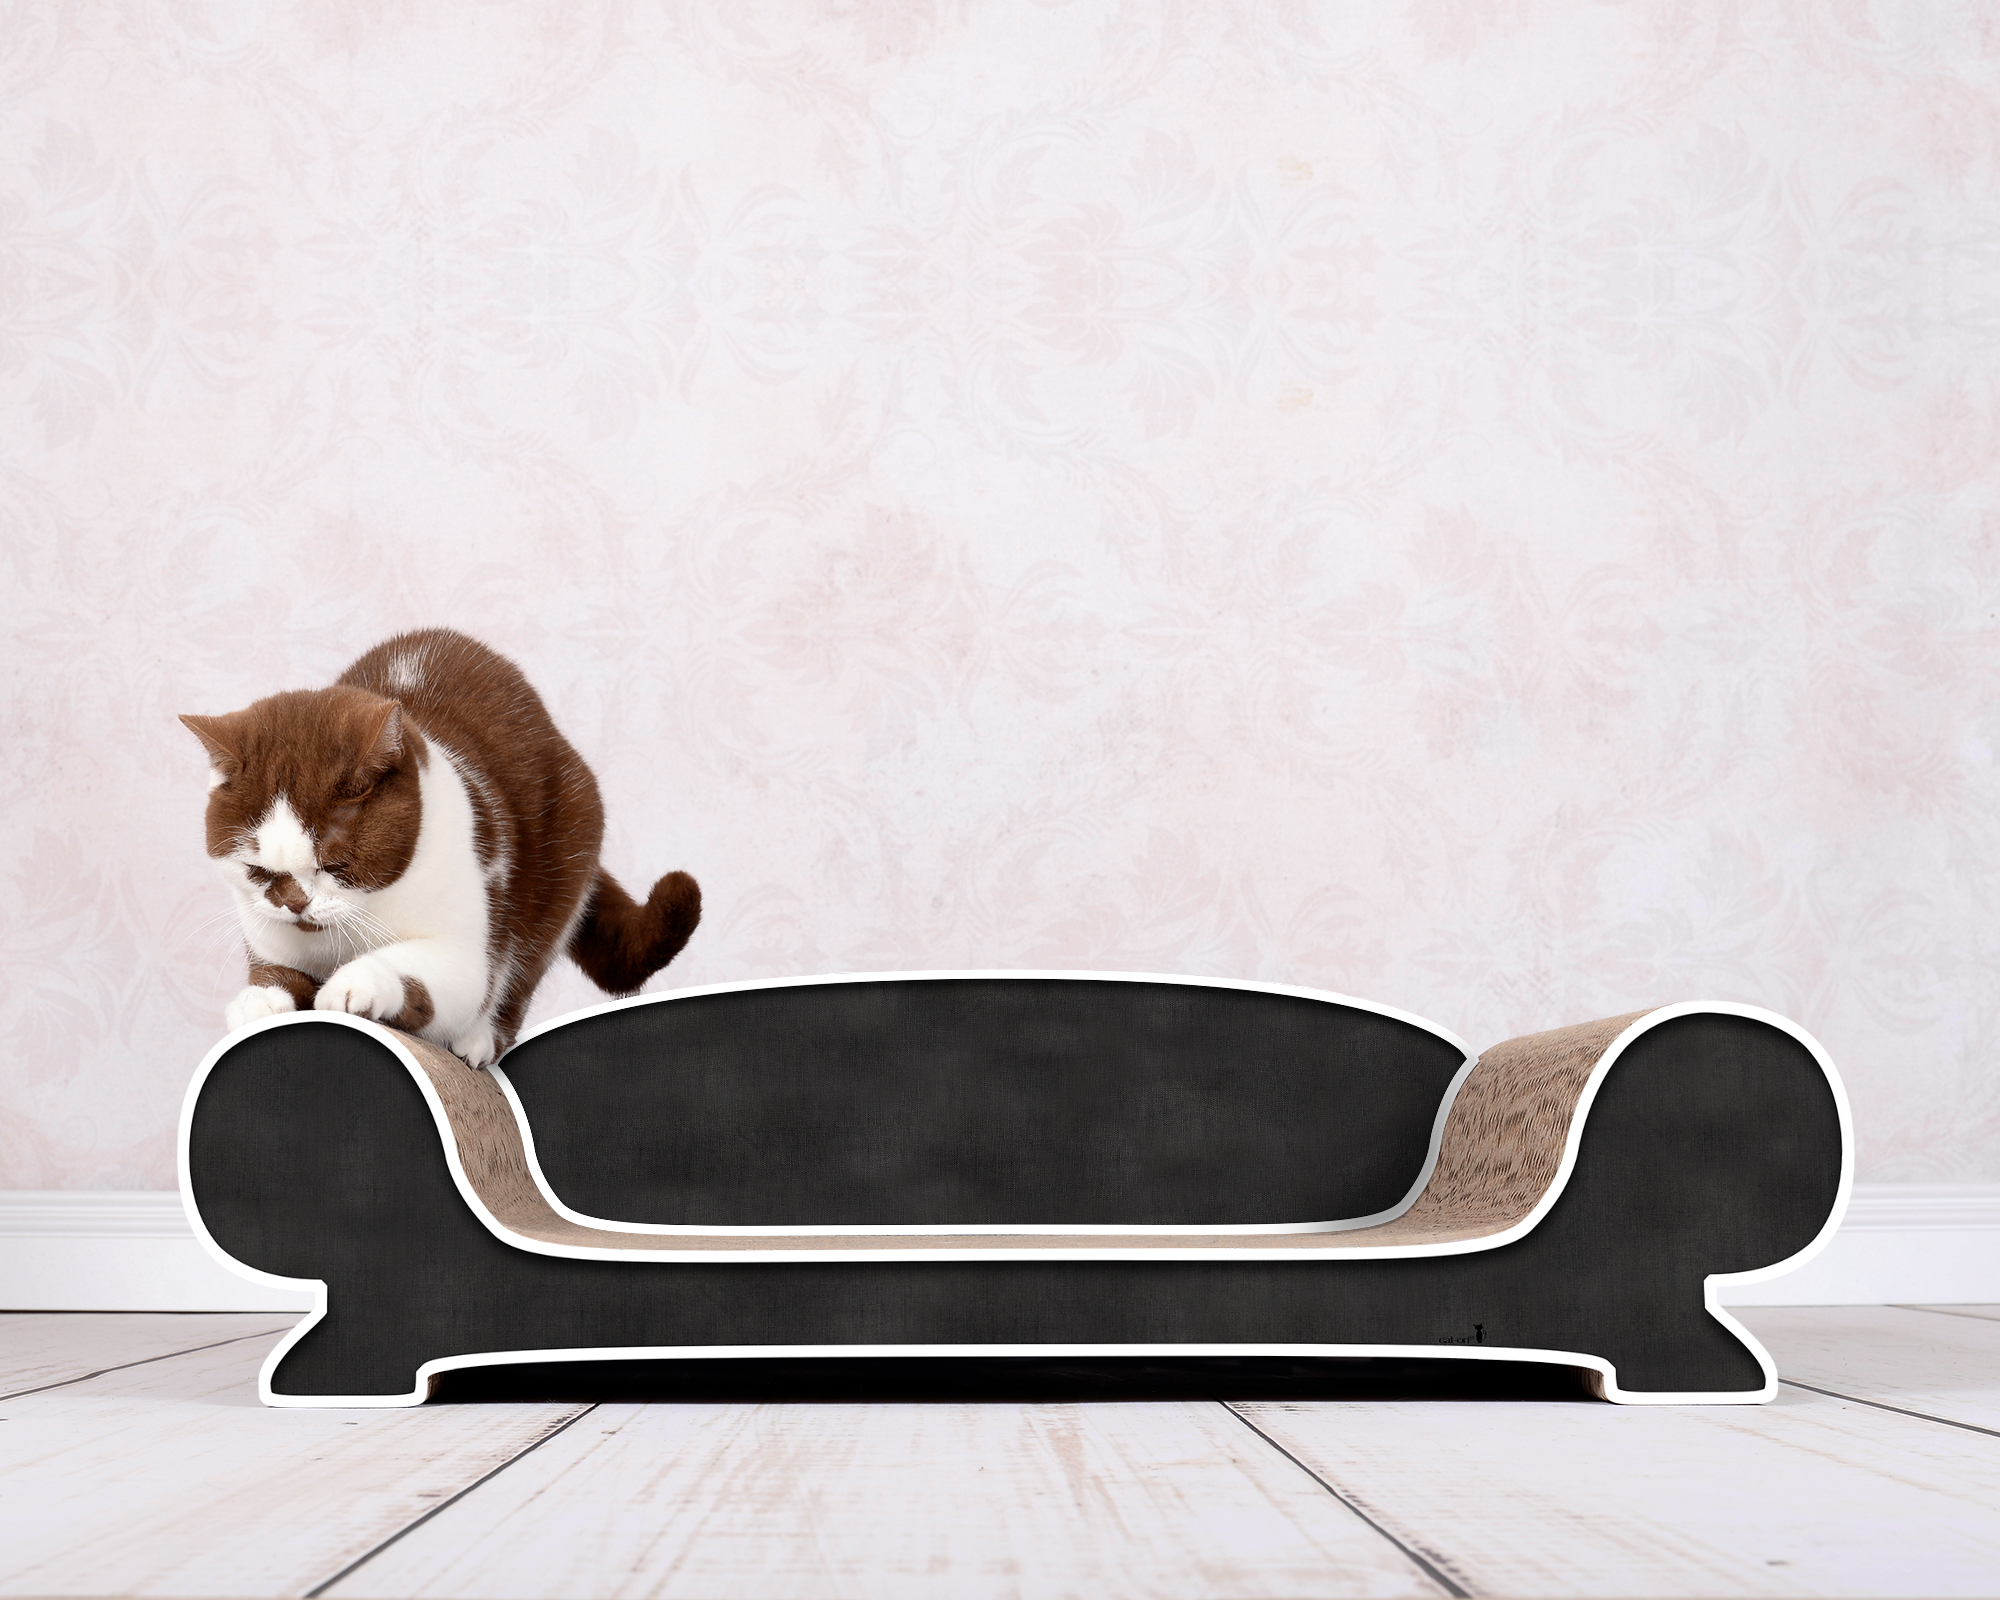 Black cat lounge Vertige with white rims